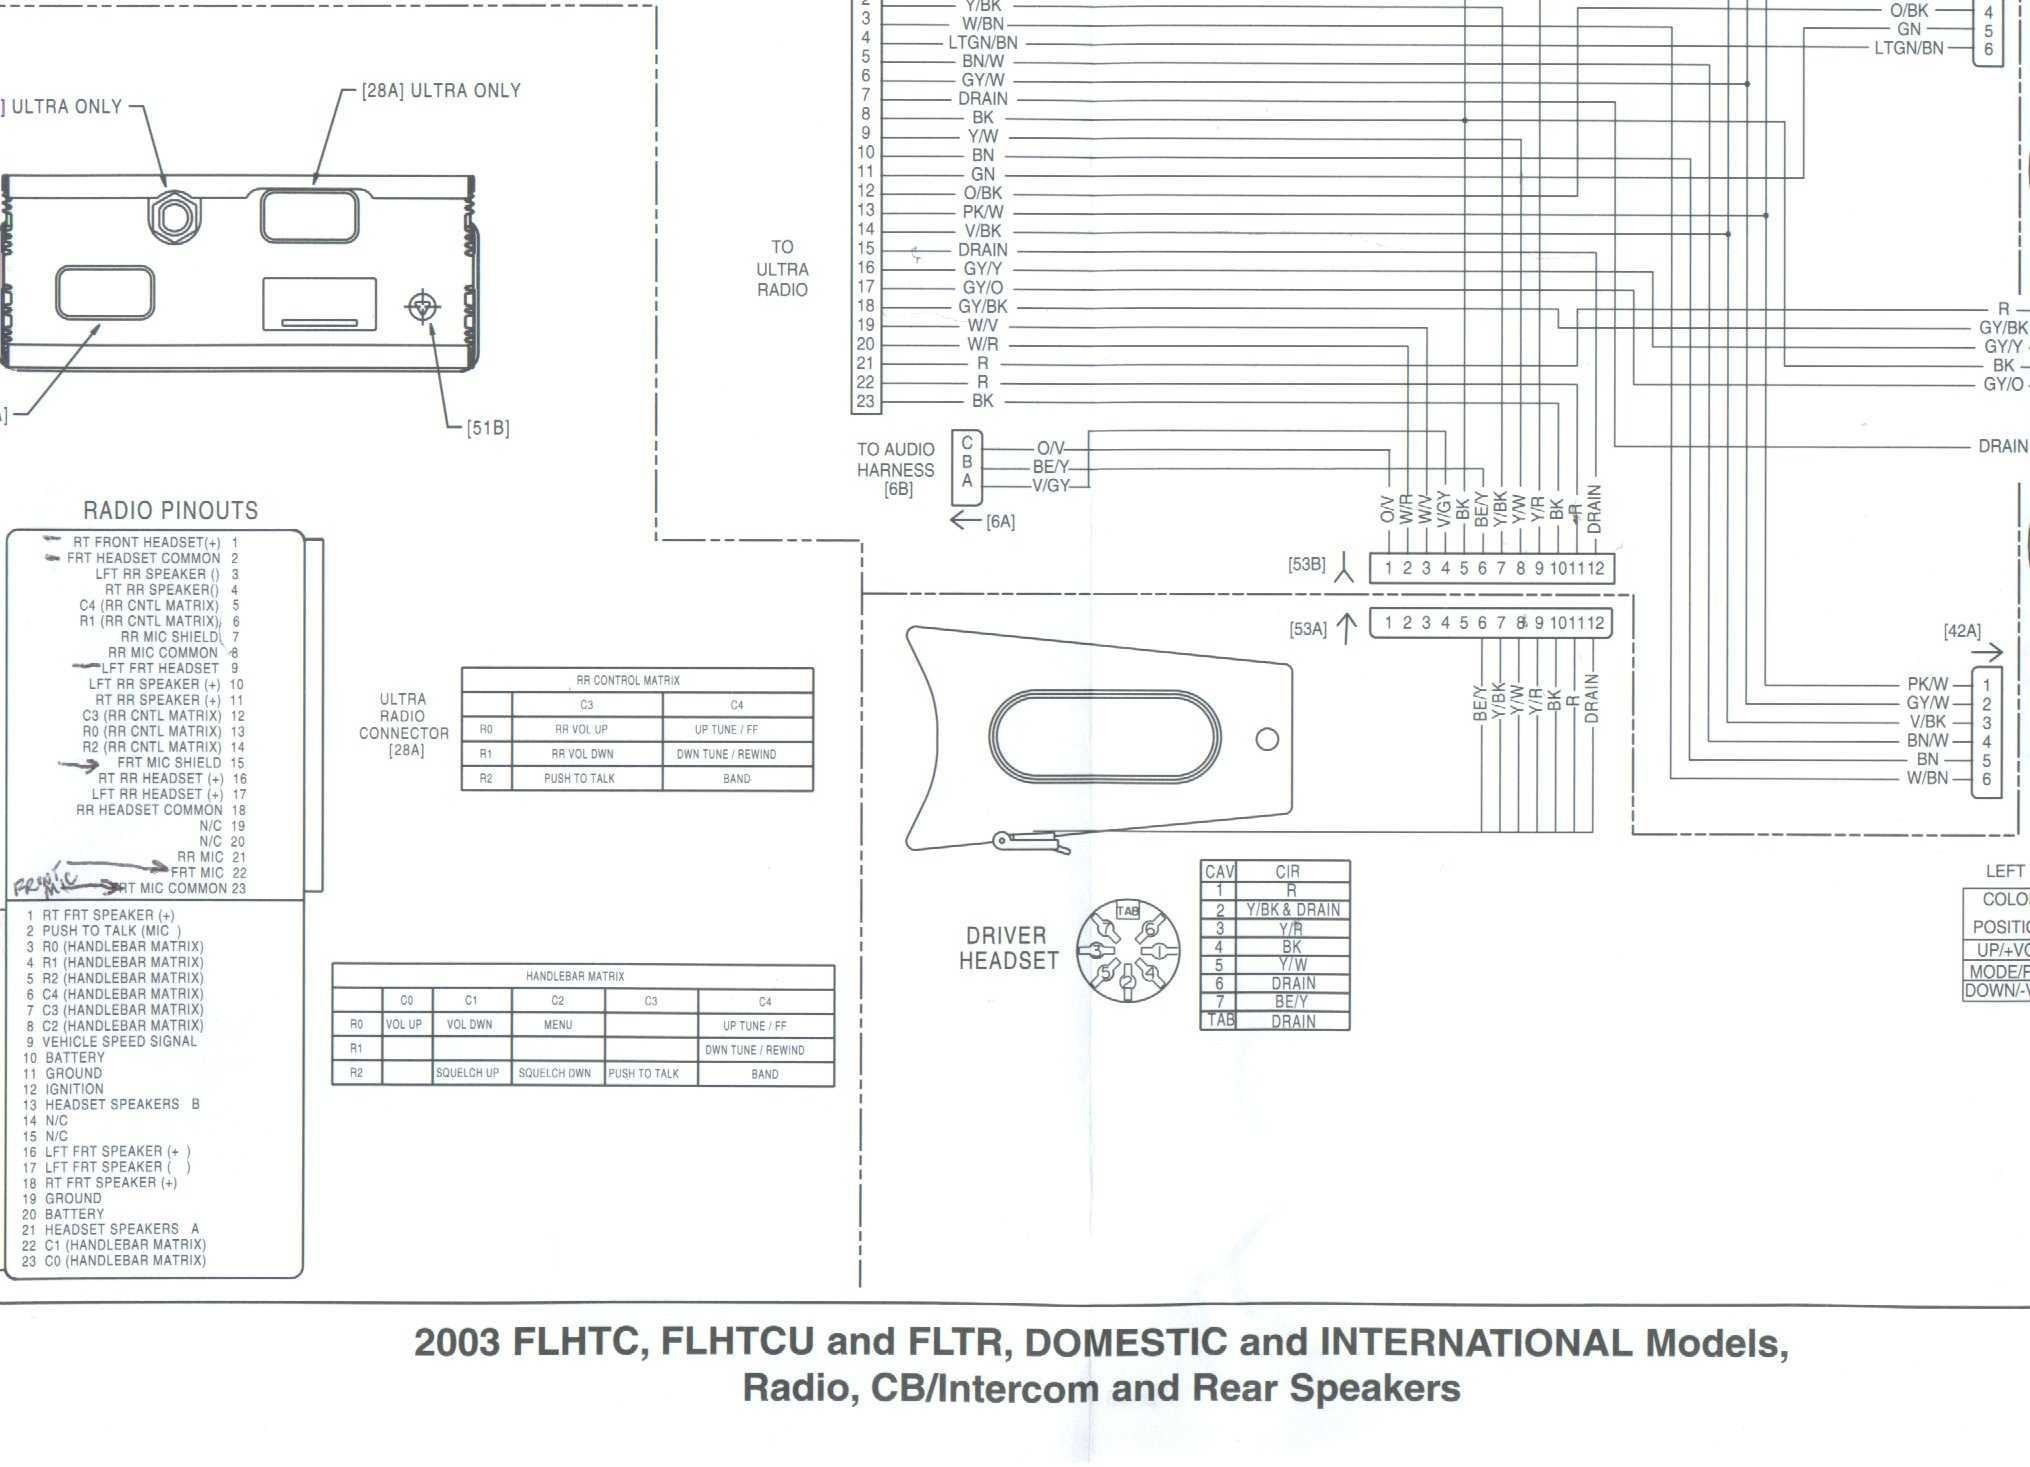 Sound System Wiring Diagram sony Radio Wiring Diagram ... on mack transmission diagram, mack steering diagram, mack hvac diagram, mack motor diagram, mack rear end diagram, mack fuel system diagram, mack pump diagram, mack relay diagram, mack engine diagram, mack fuse diagram, mack suspension, mack parts diagram,